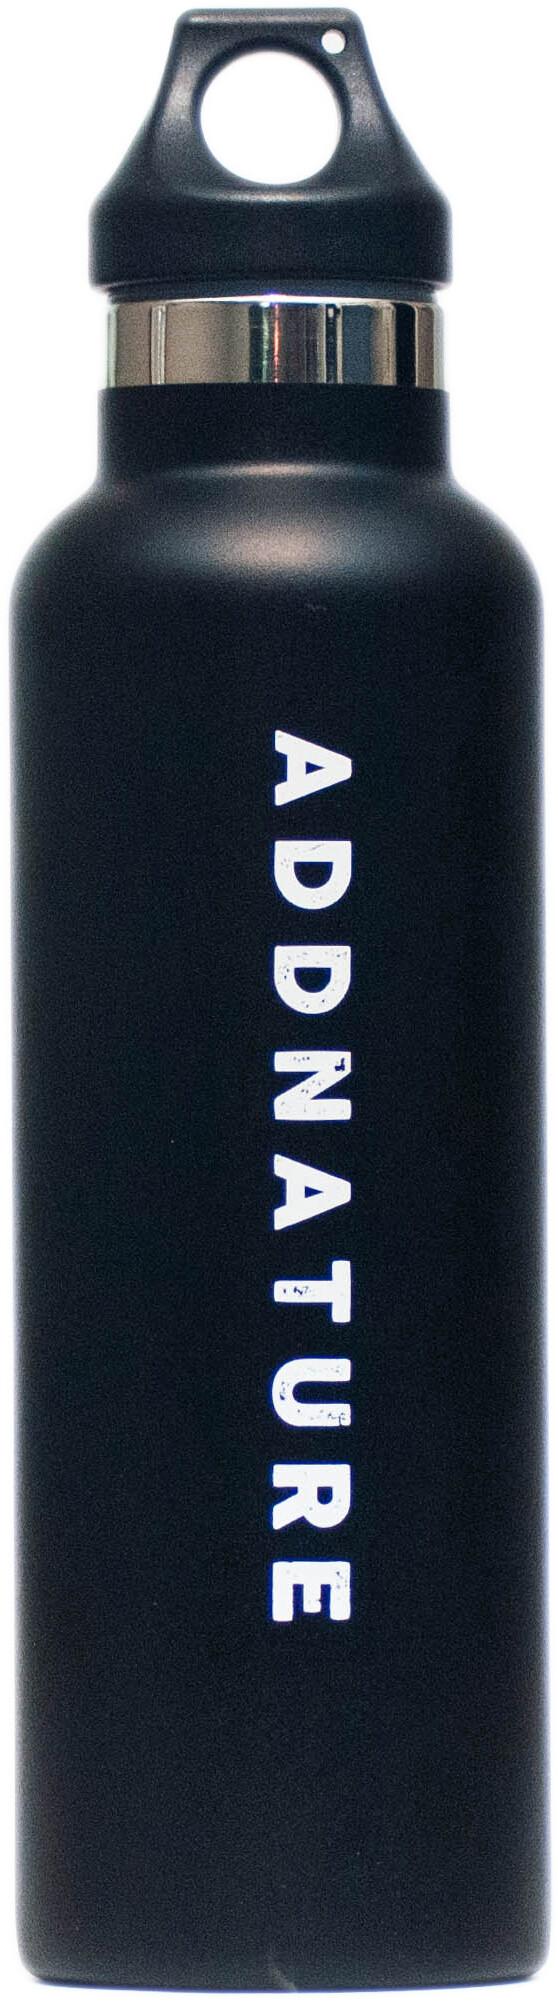 addnature Insulated Bottle 620ml silveraddnature print